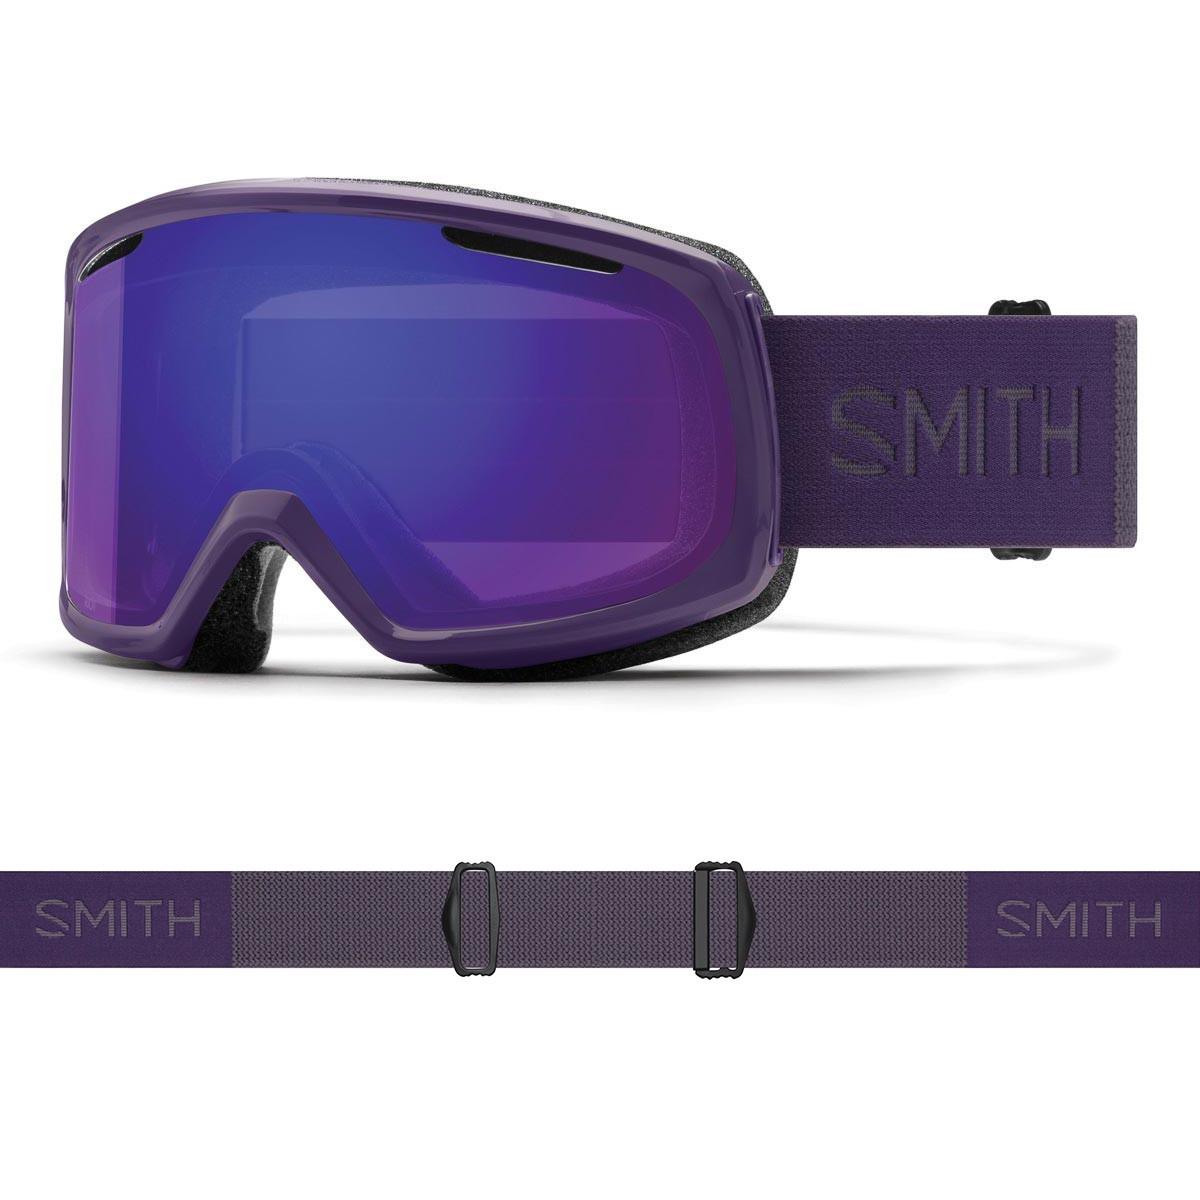 SMITH RIOT violet 2021 | S2 CHROMAPOP Everyday Violet Mirror - Изображение - AQUAMATRIX